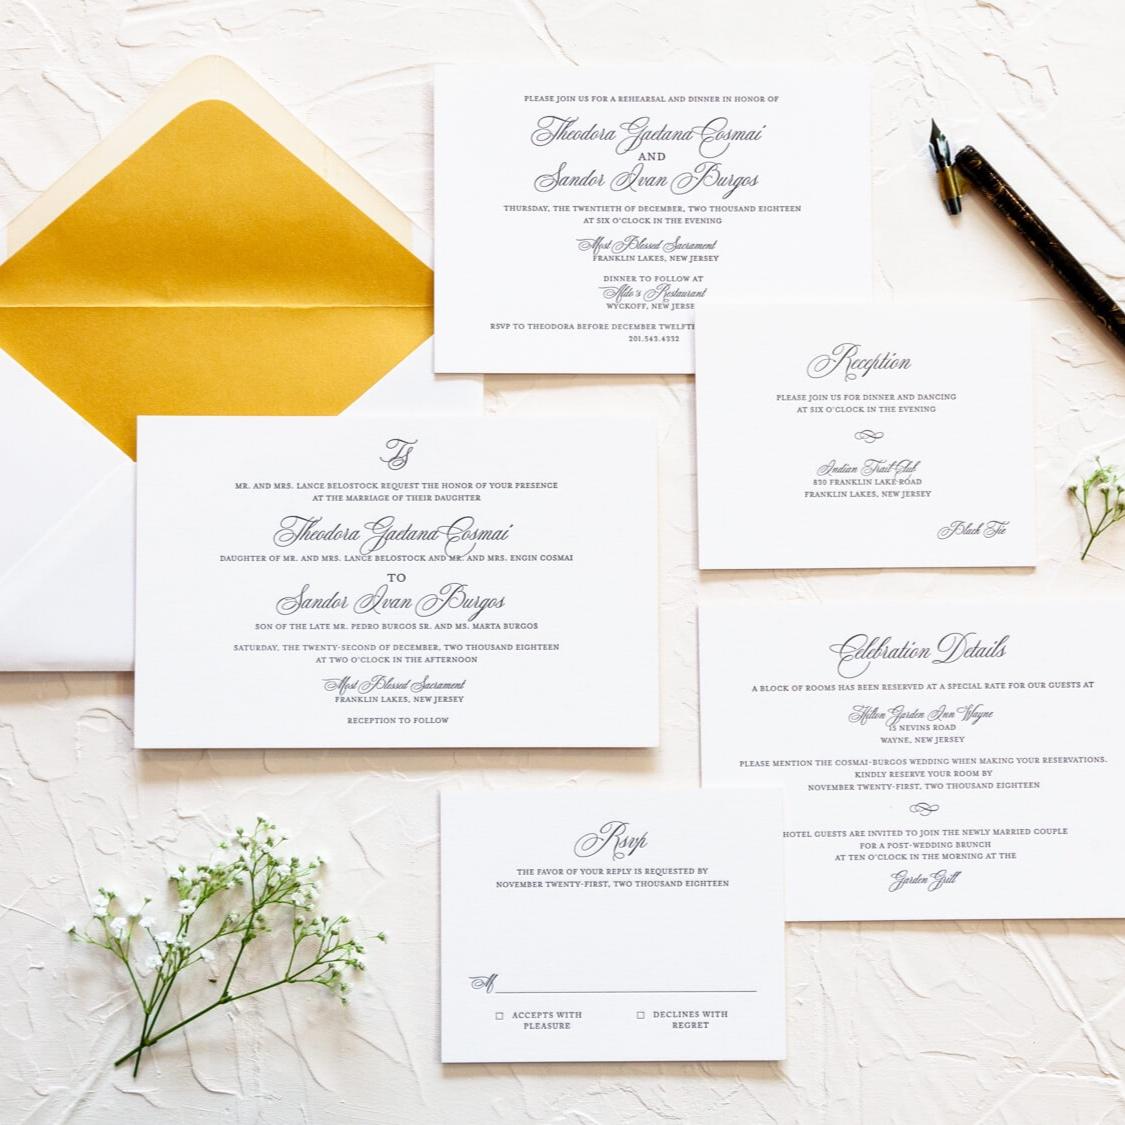 Theodora & Sandor - Wedding Invitations, Ceremony Programs, Menus, & Place Cards